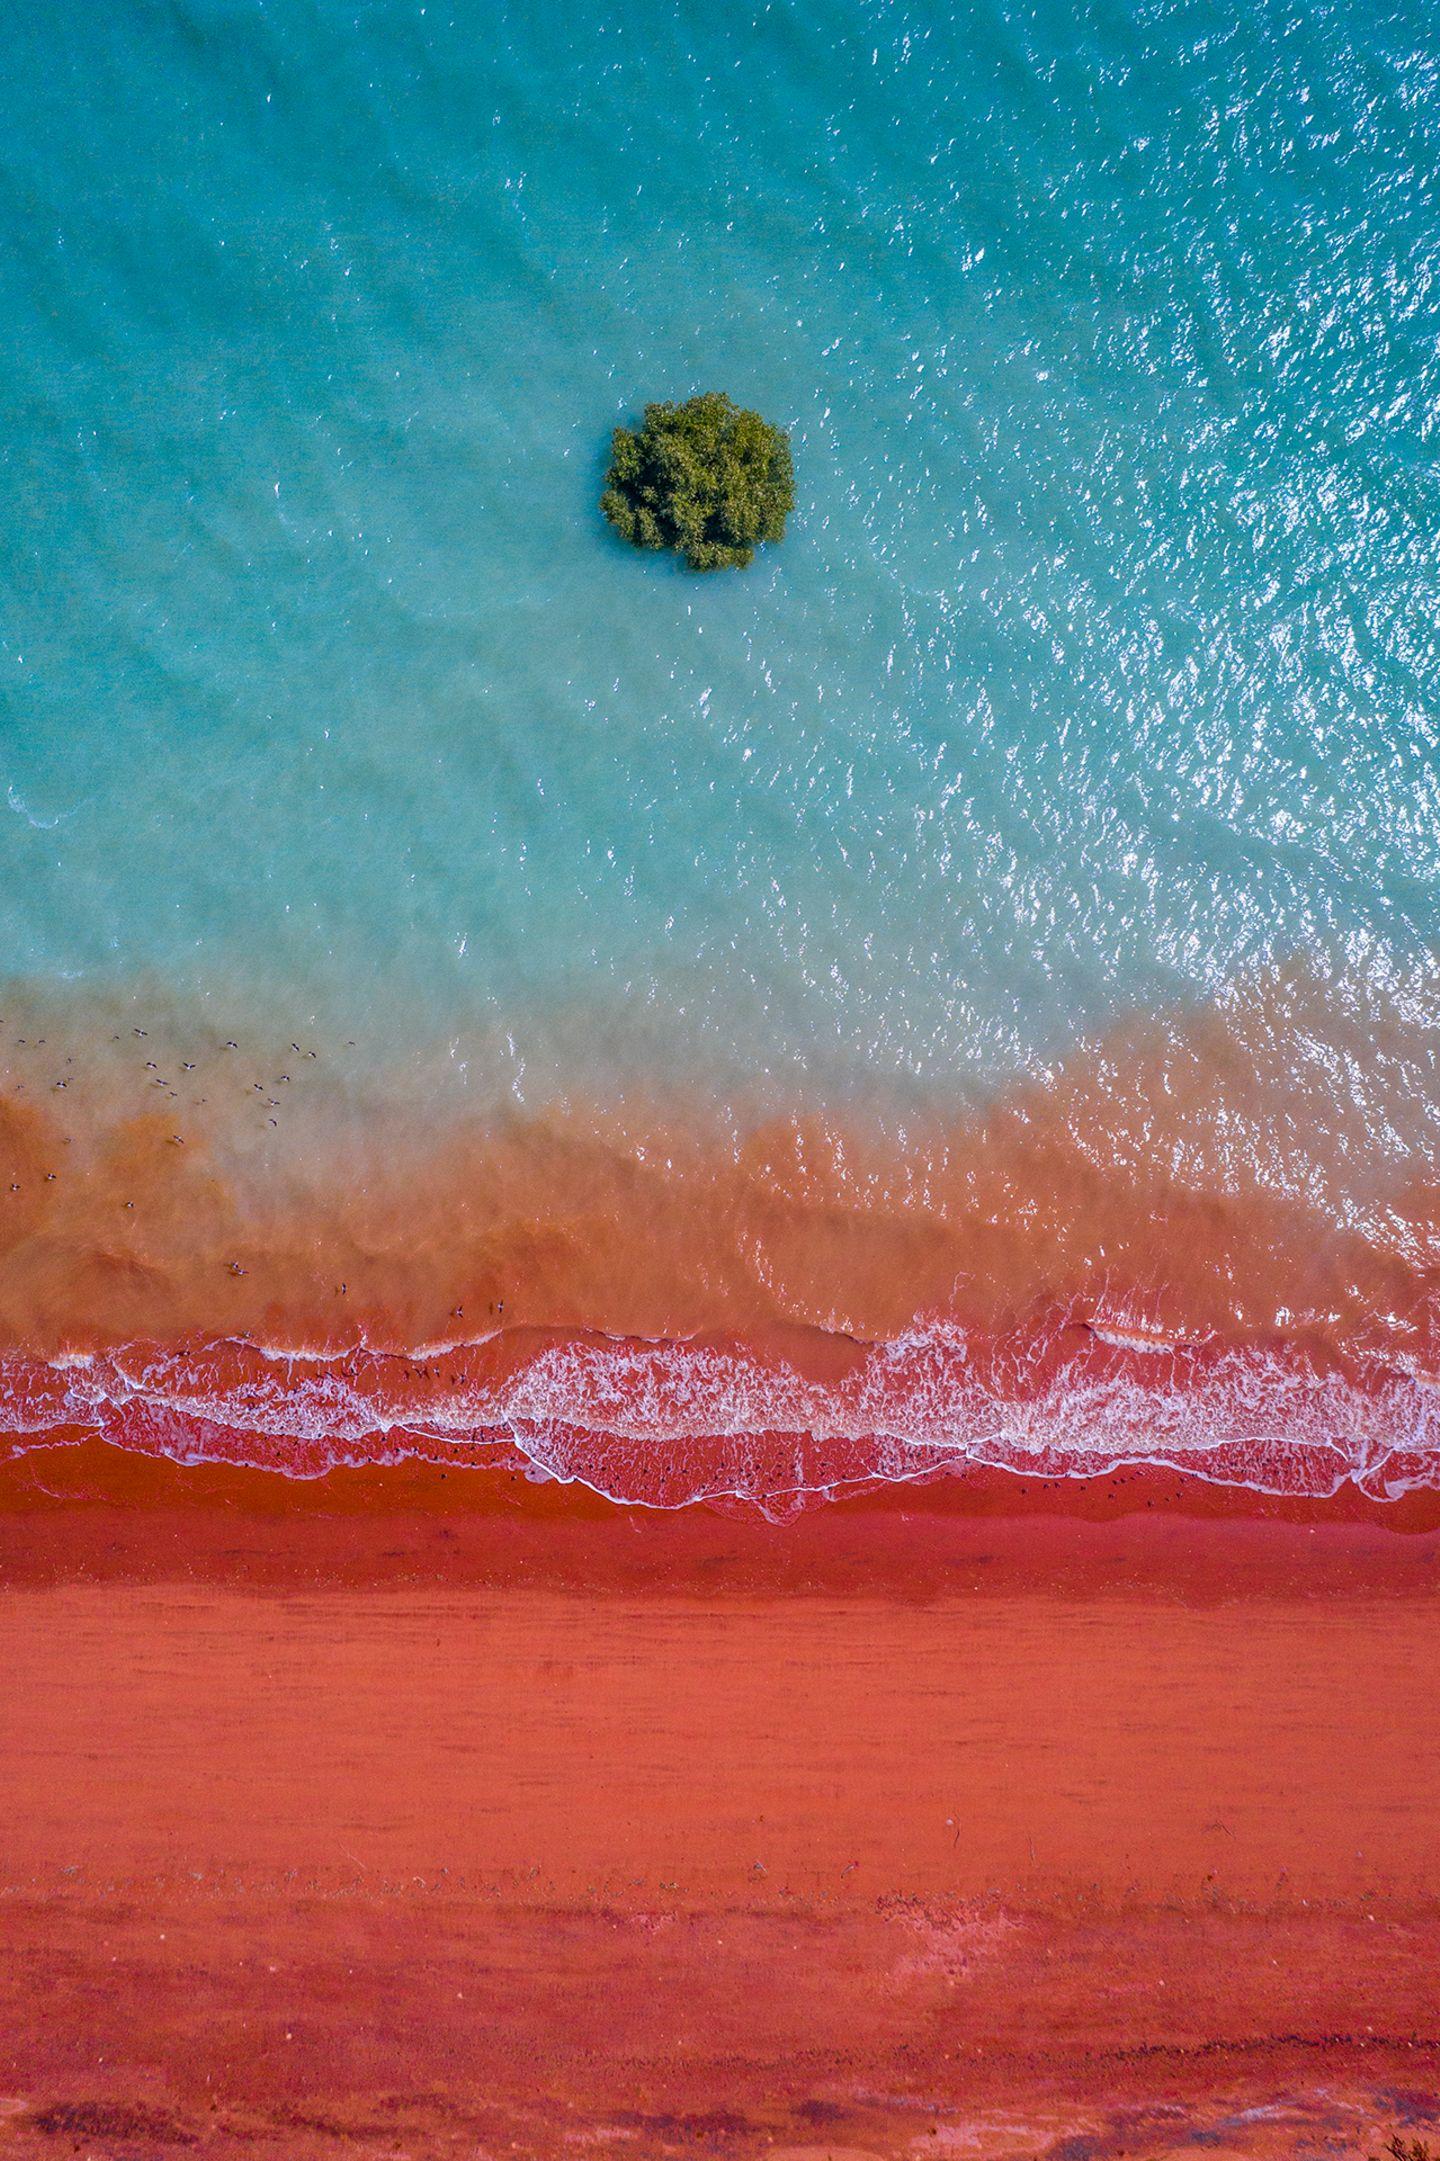 © Scott Portelli, Australia, Shortlist, Open, Landscape, 2021 Sony World Photography Awards